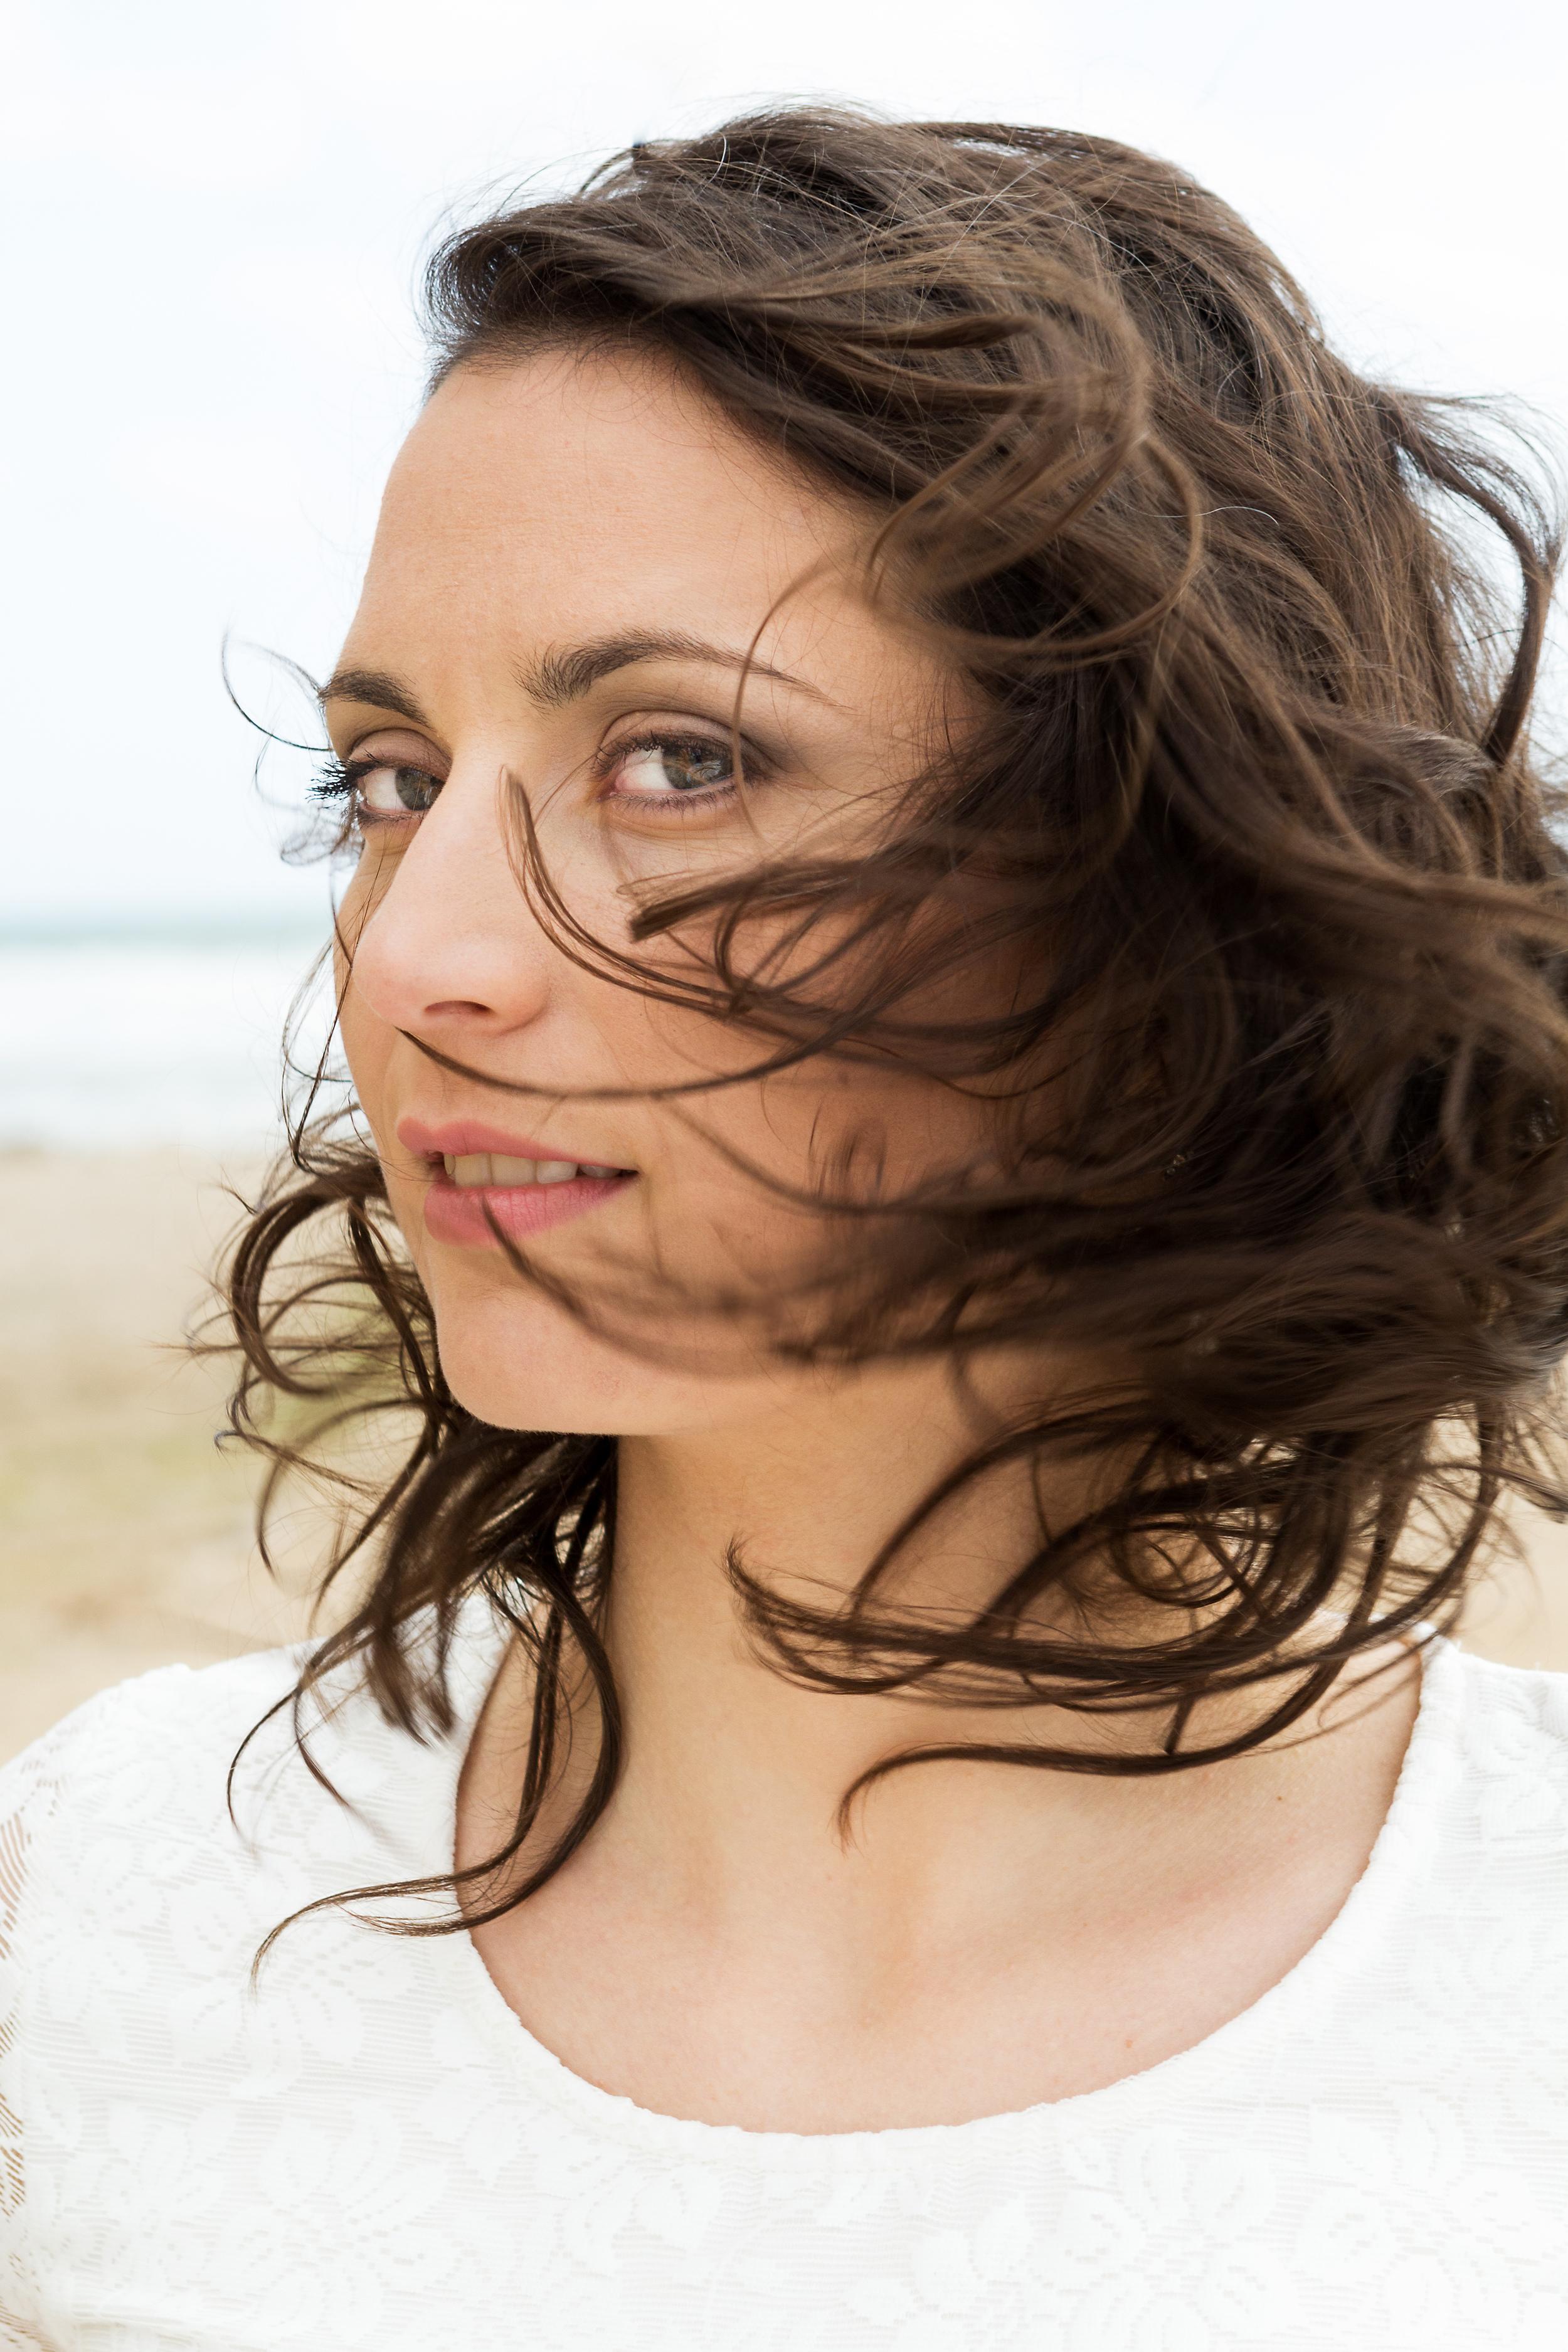 Close-up Windswept hair - High Res.jpg